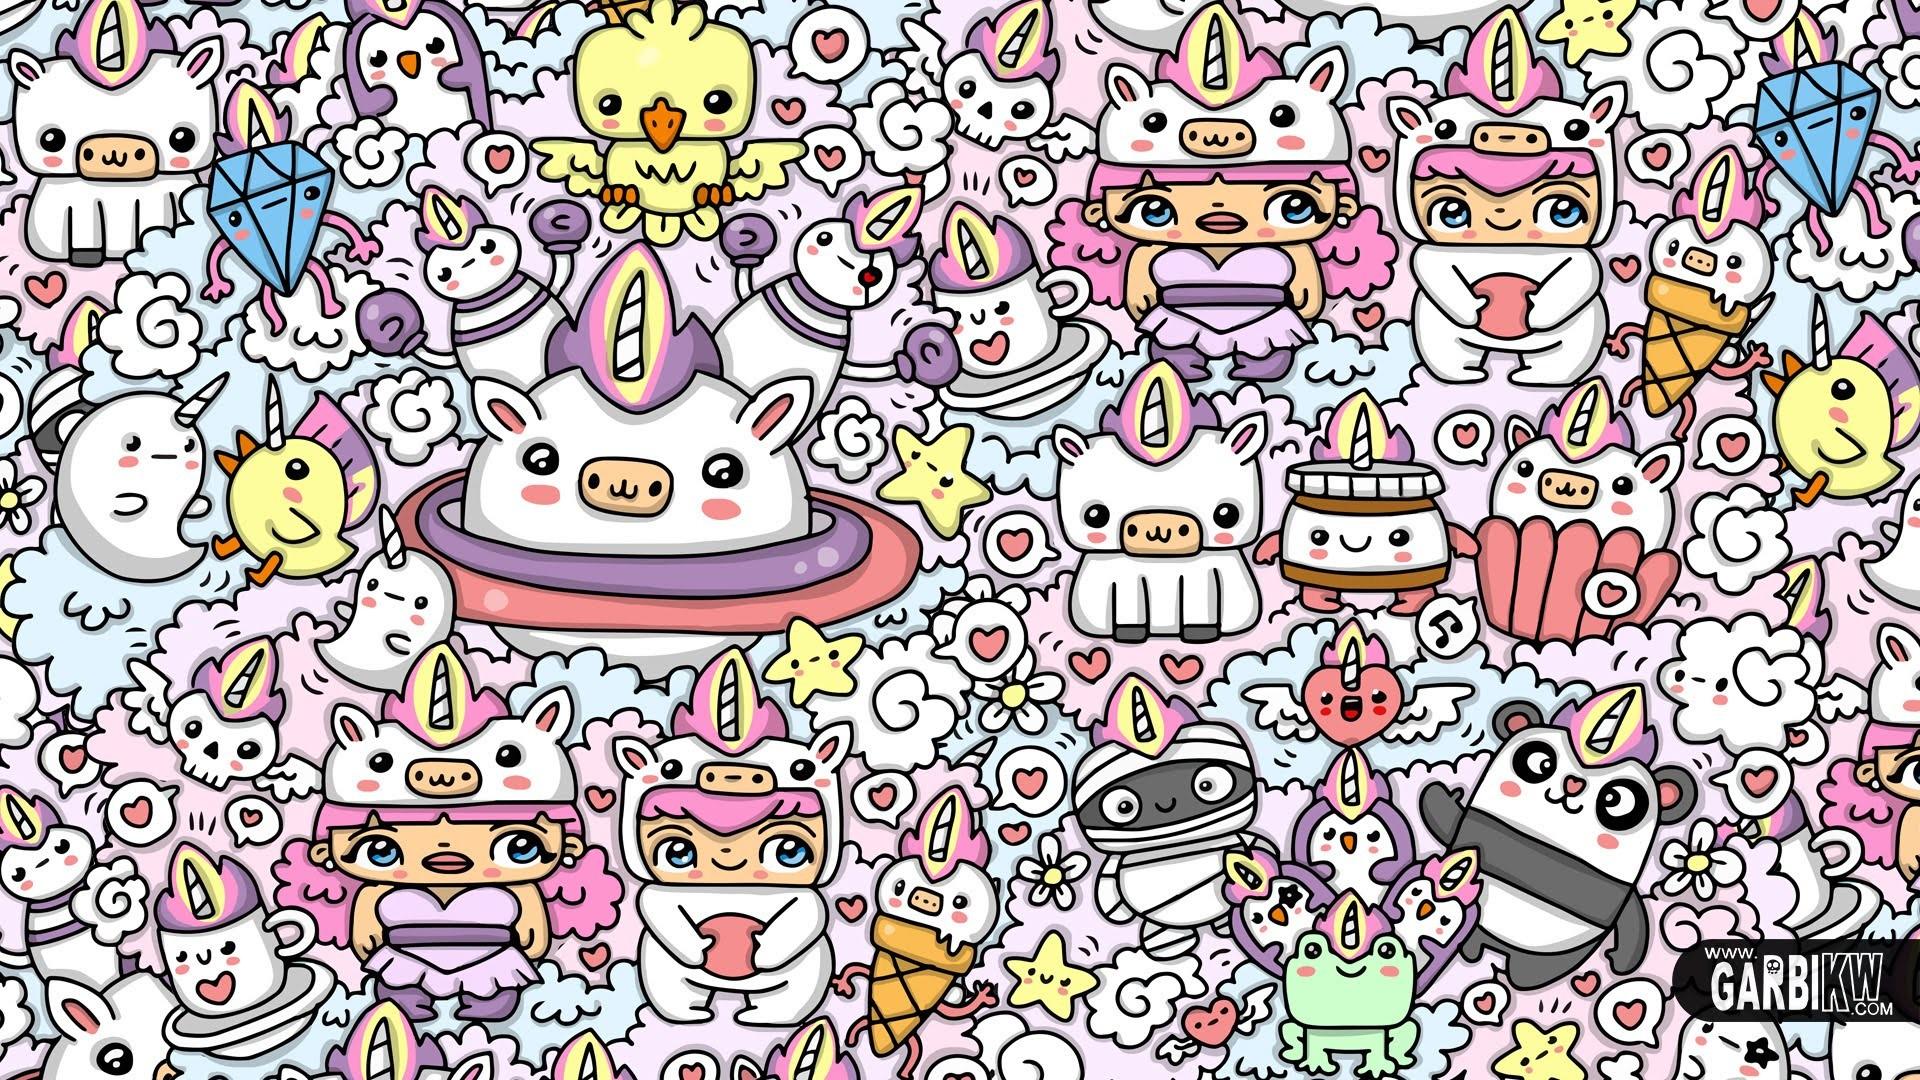 Cute Cartoon Unicorn Wallpapers Kawaii Unicorn Wallpaper 69 Images